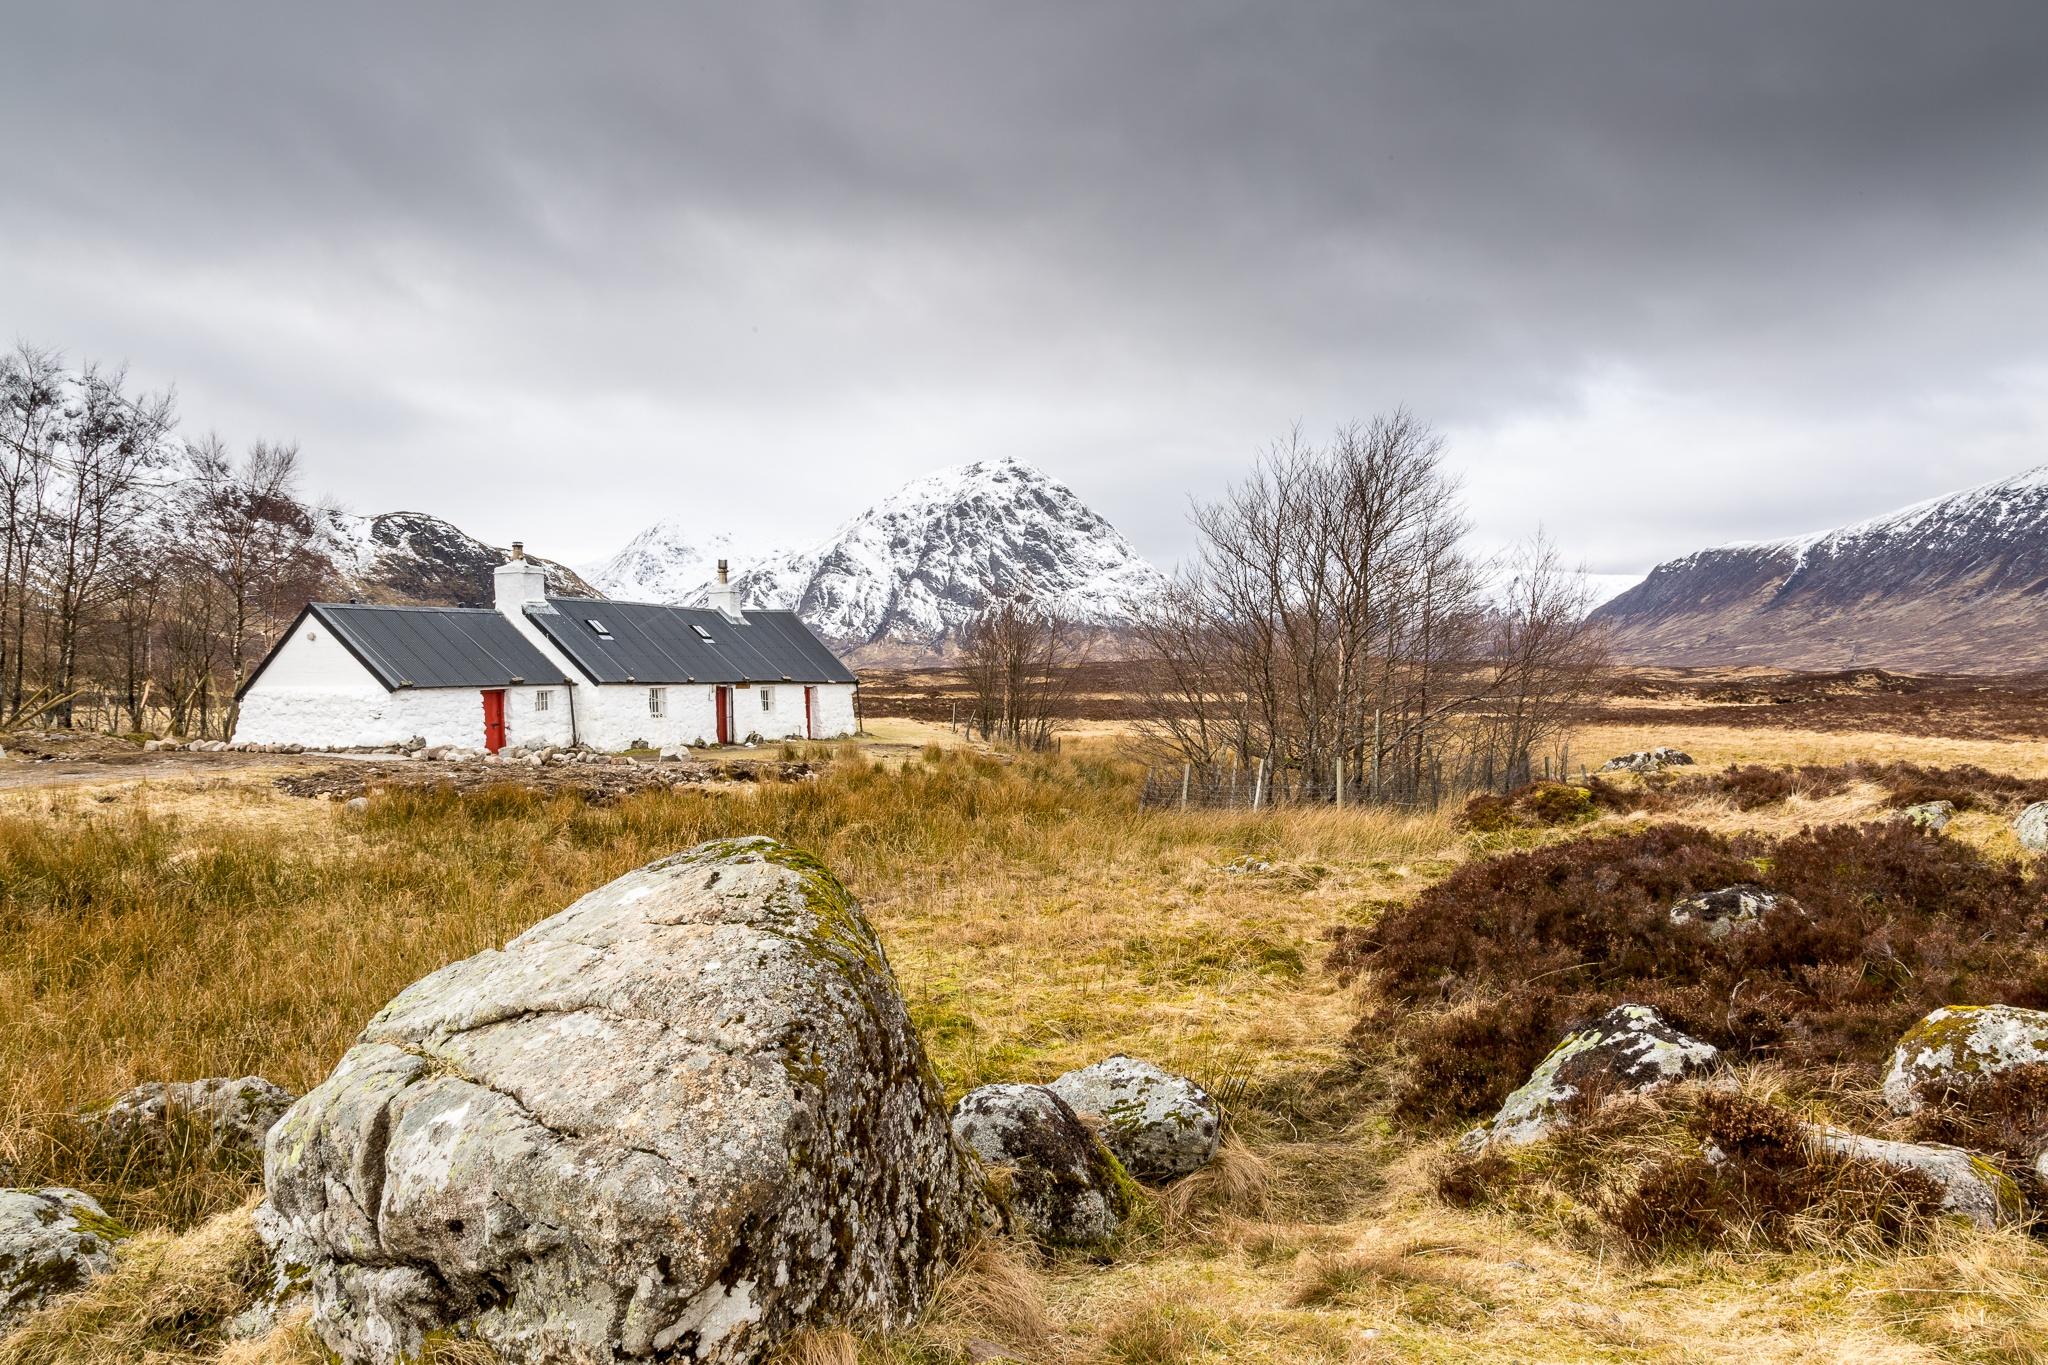 Blackrock Cottage, Glencoe by Bruce MacLennan